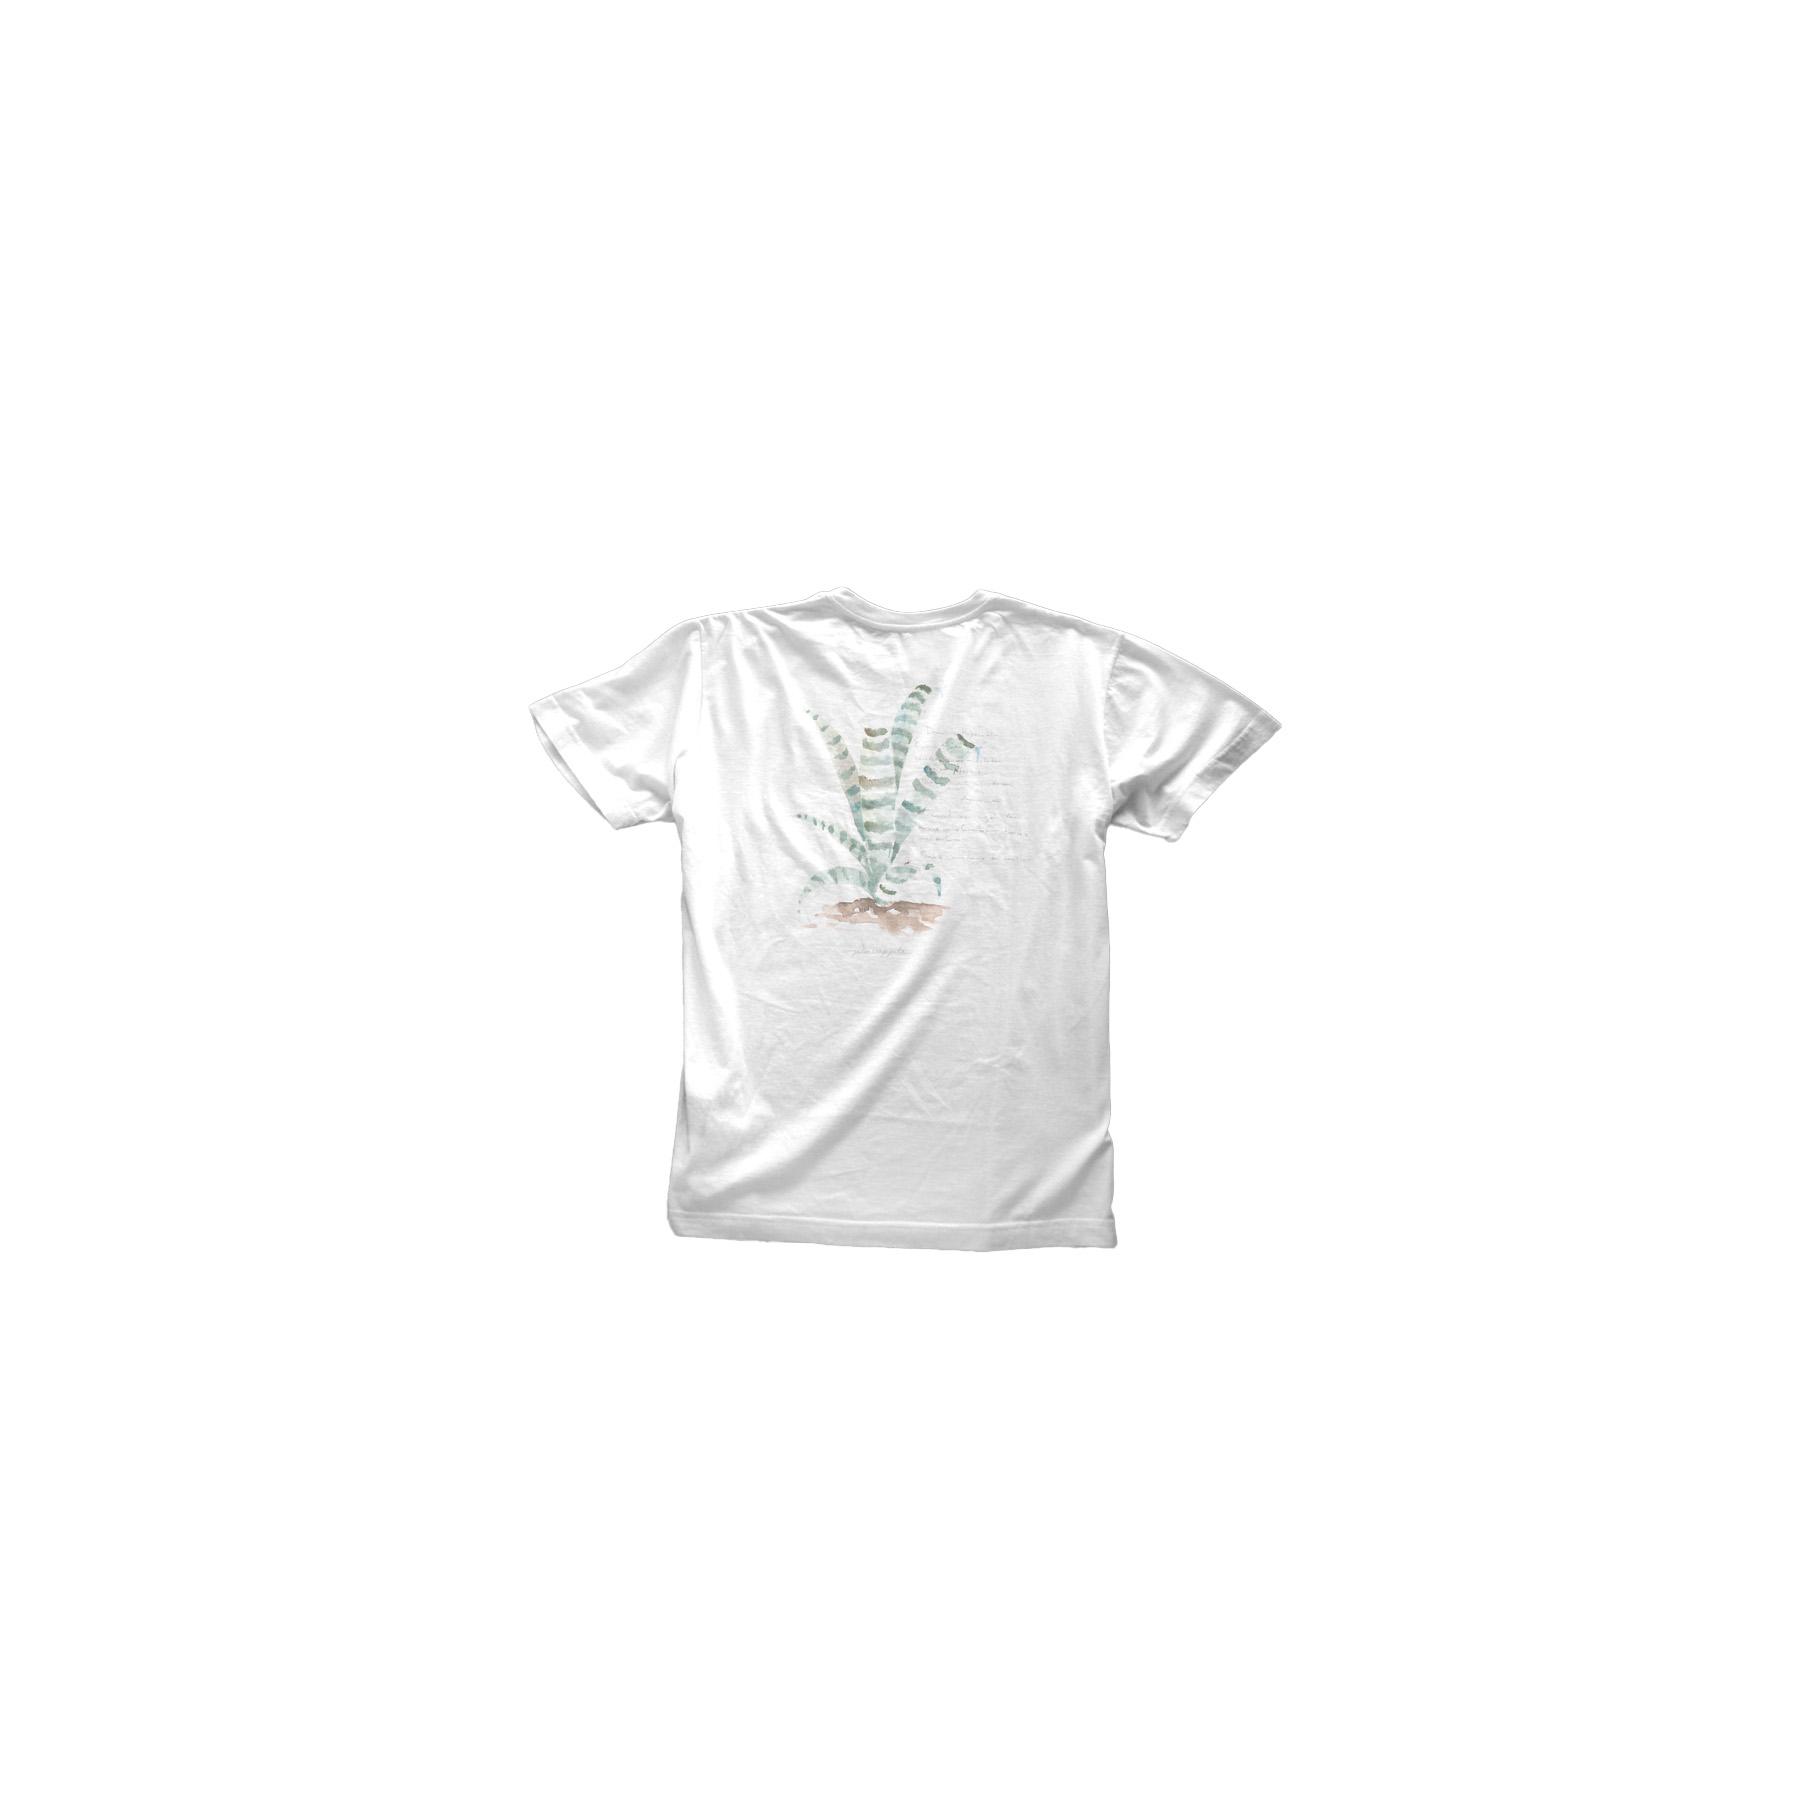 T-Shirt Silk Botanica Off White Pineapple